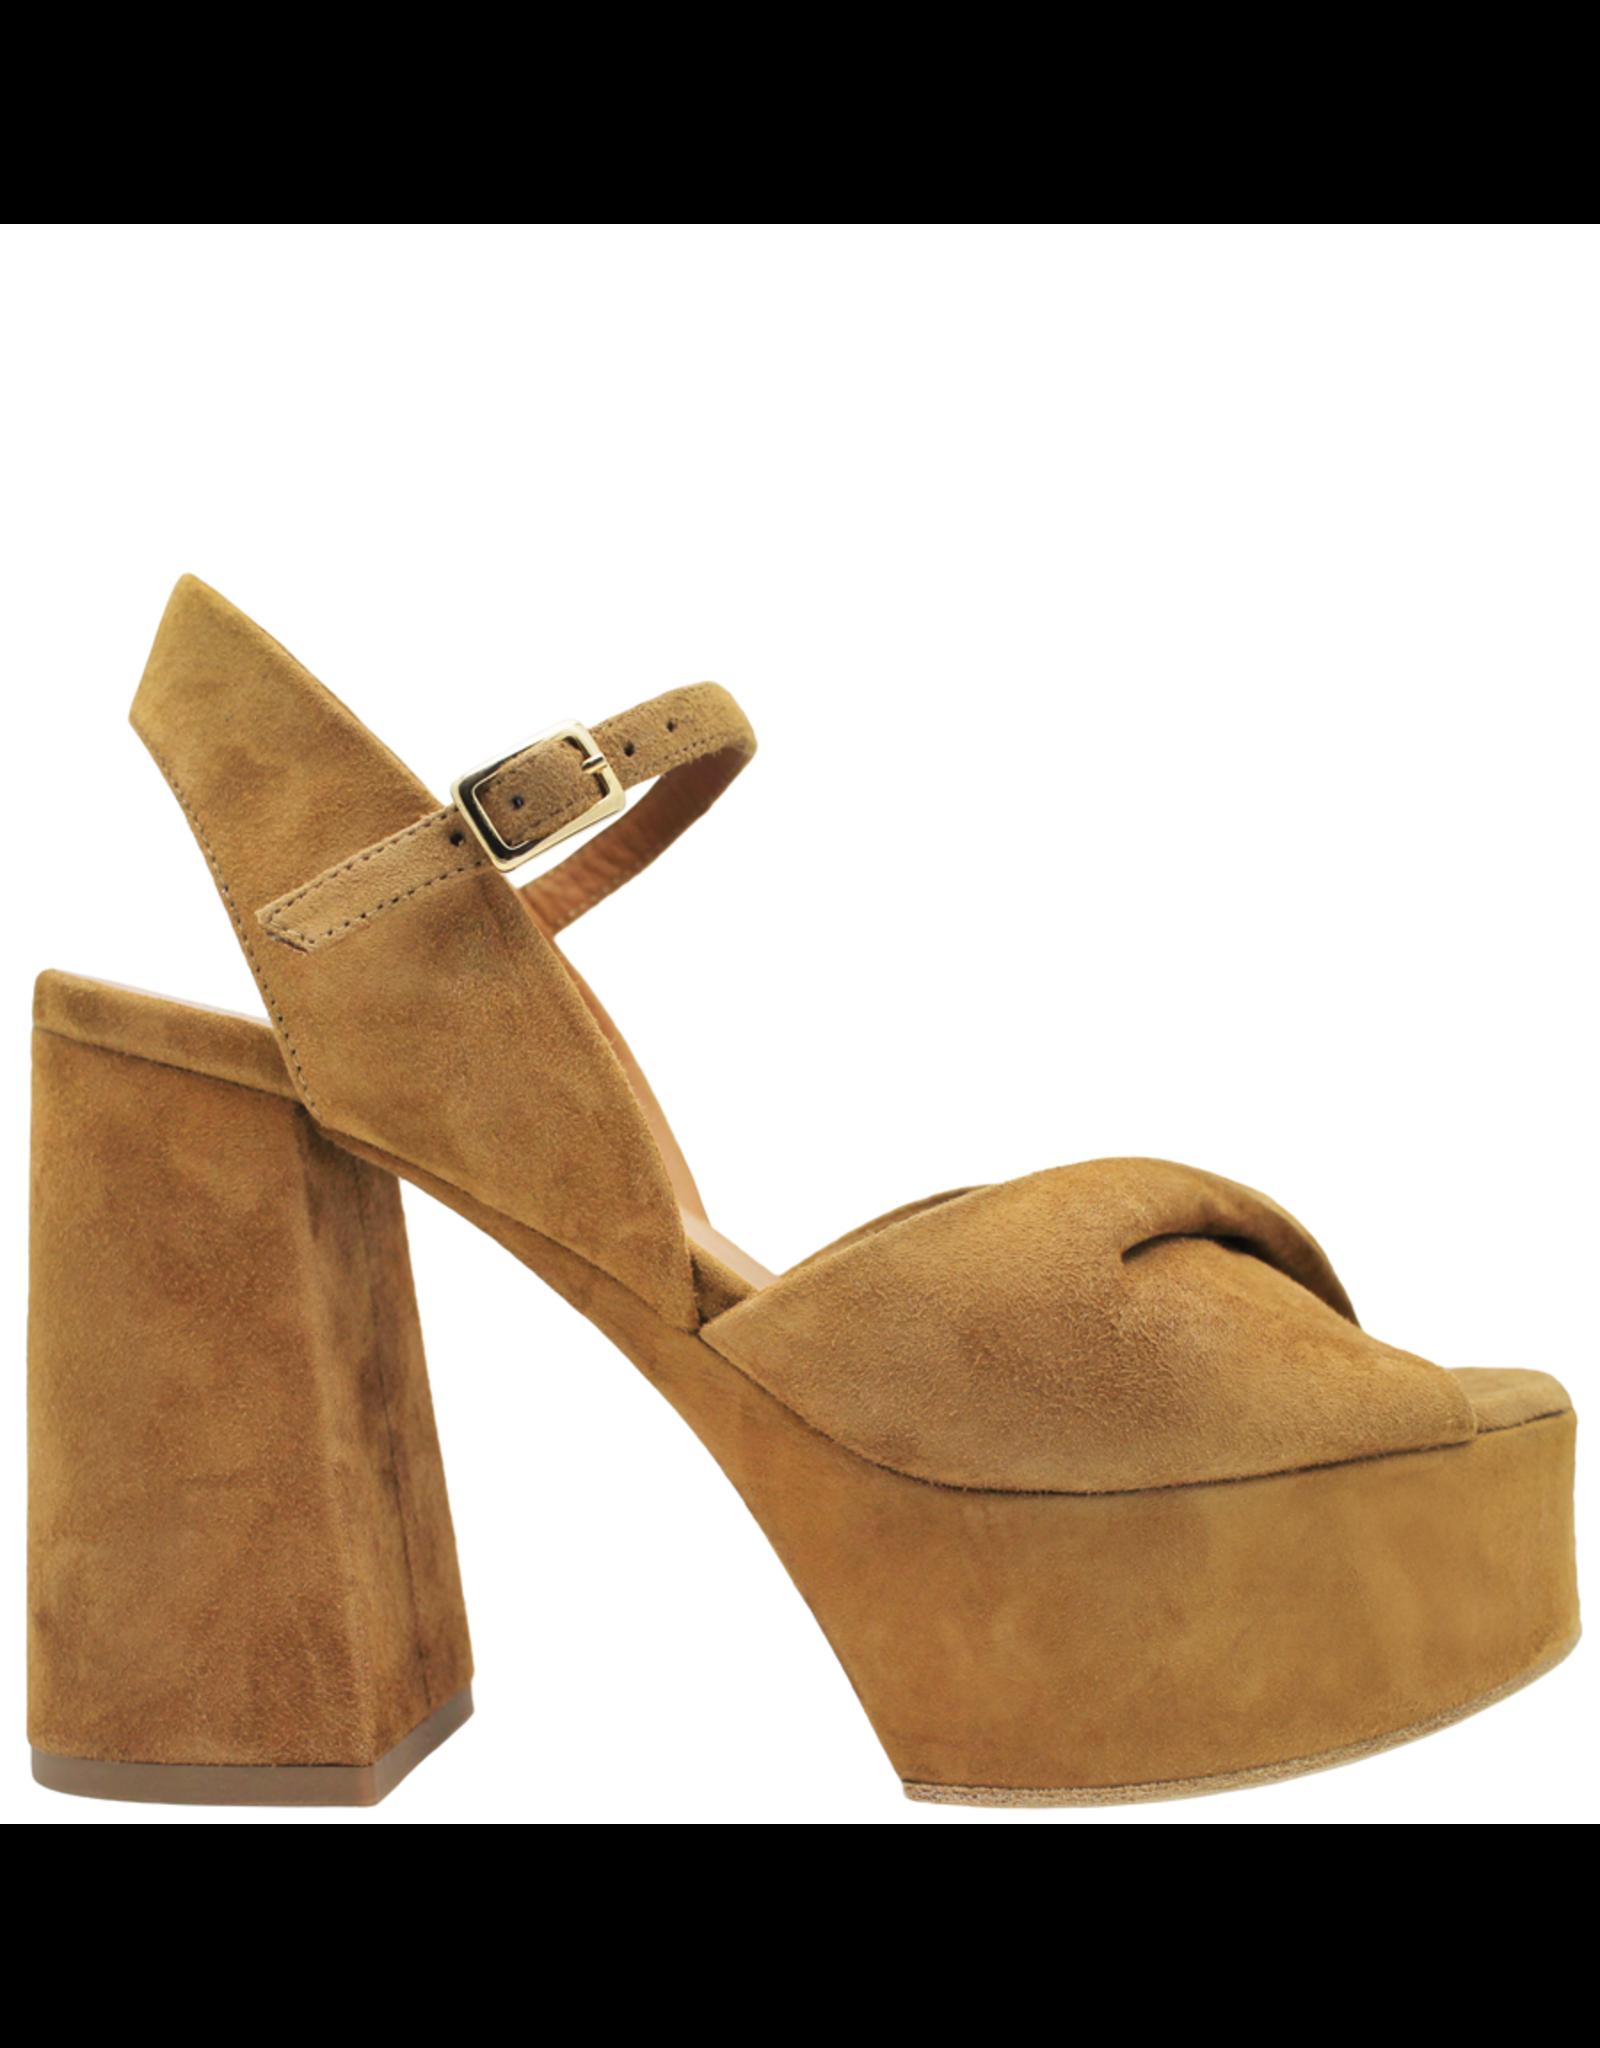 VicMatie VicMatie Biscuit Suede Twist Platform Sandal 8572